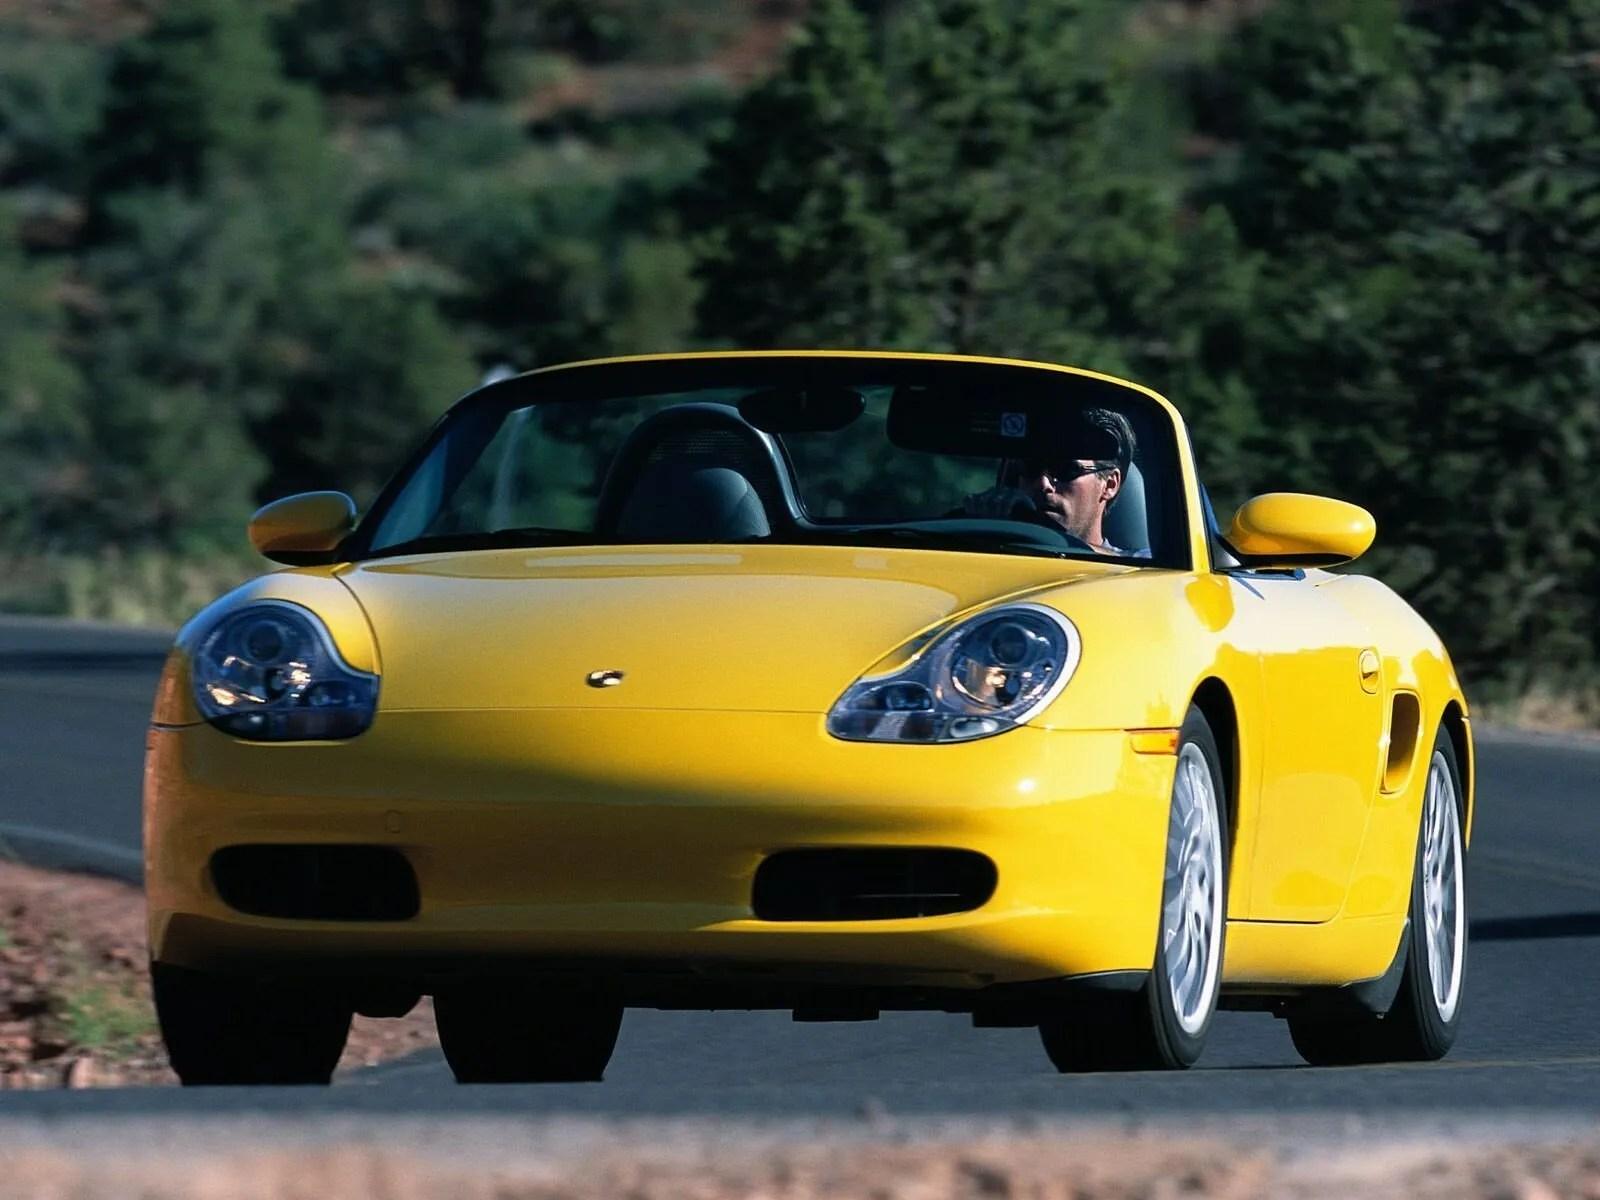 Small Deck Diagram 1997 2004 Porsche Boxster 986 Review Top Speed